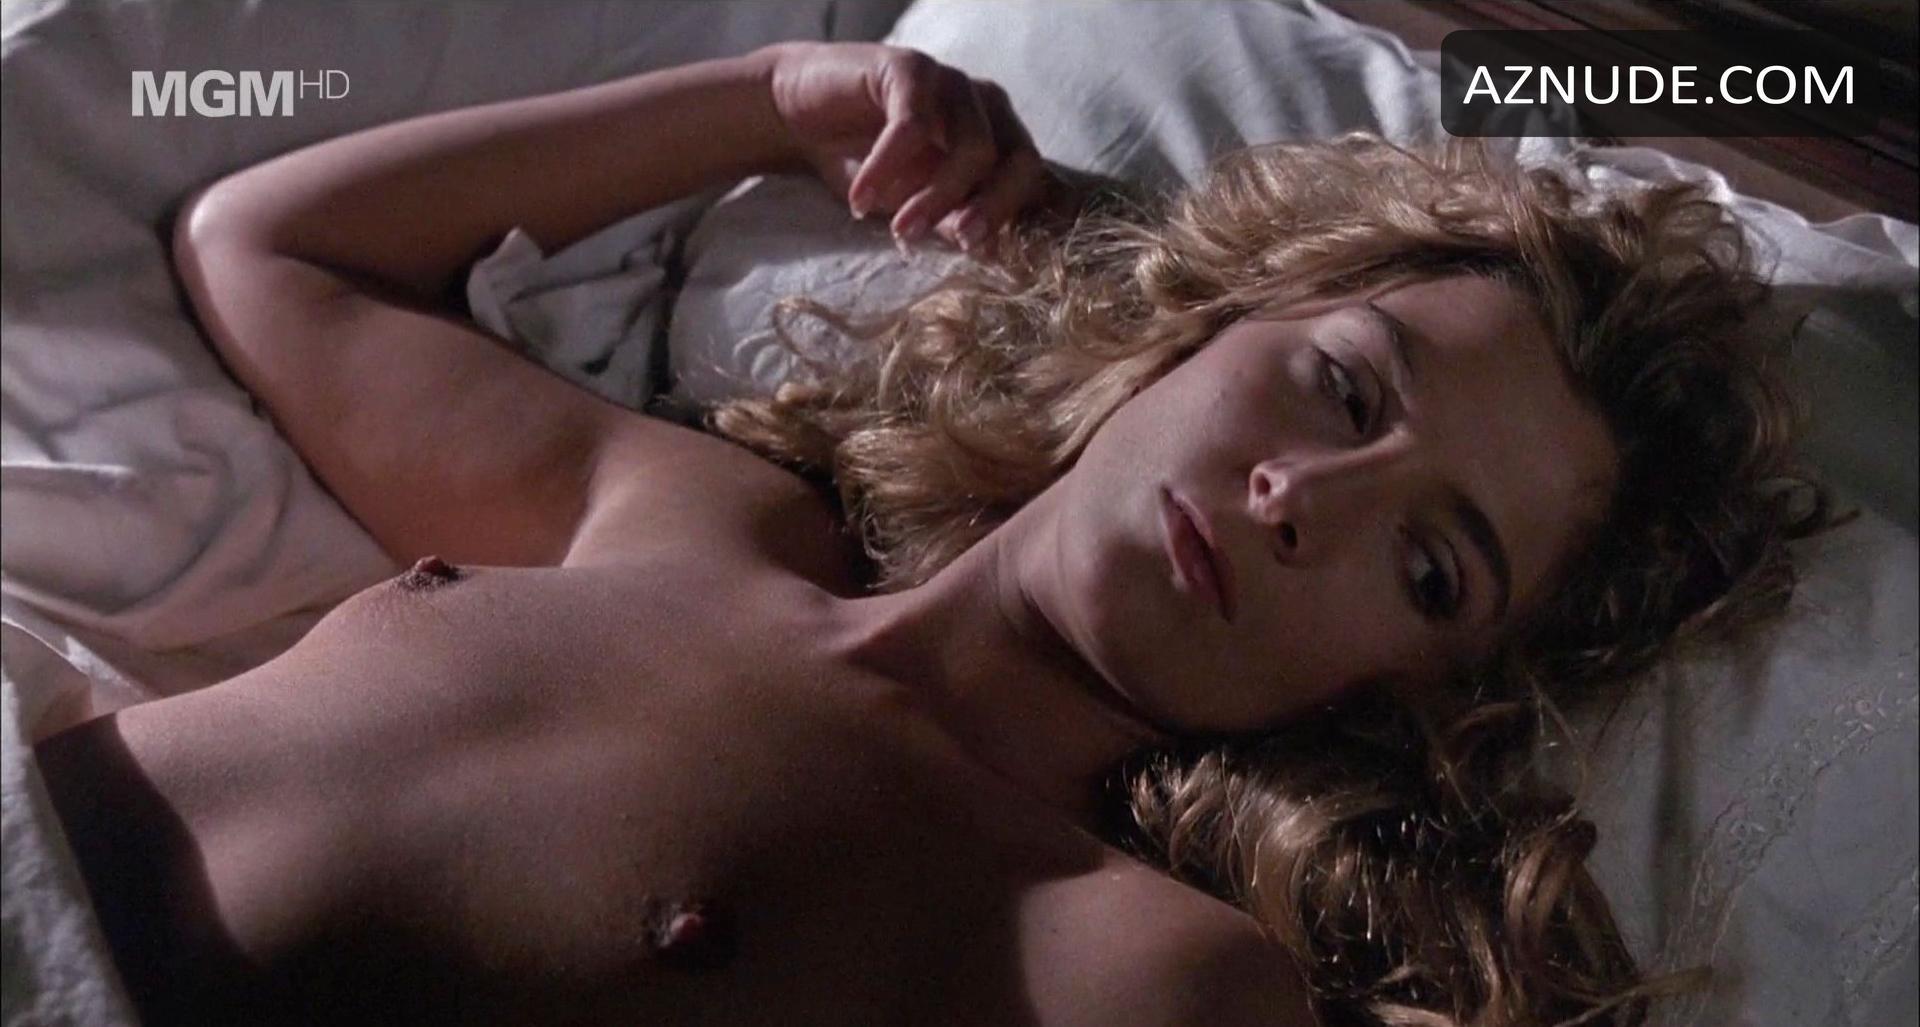 natasha richardson nude pic